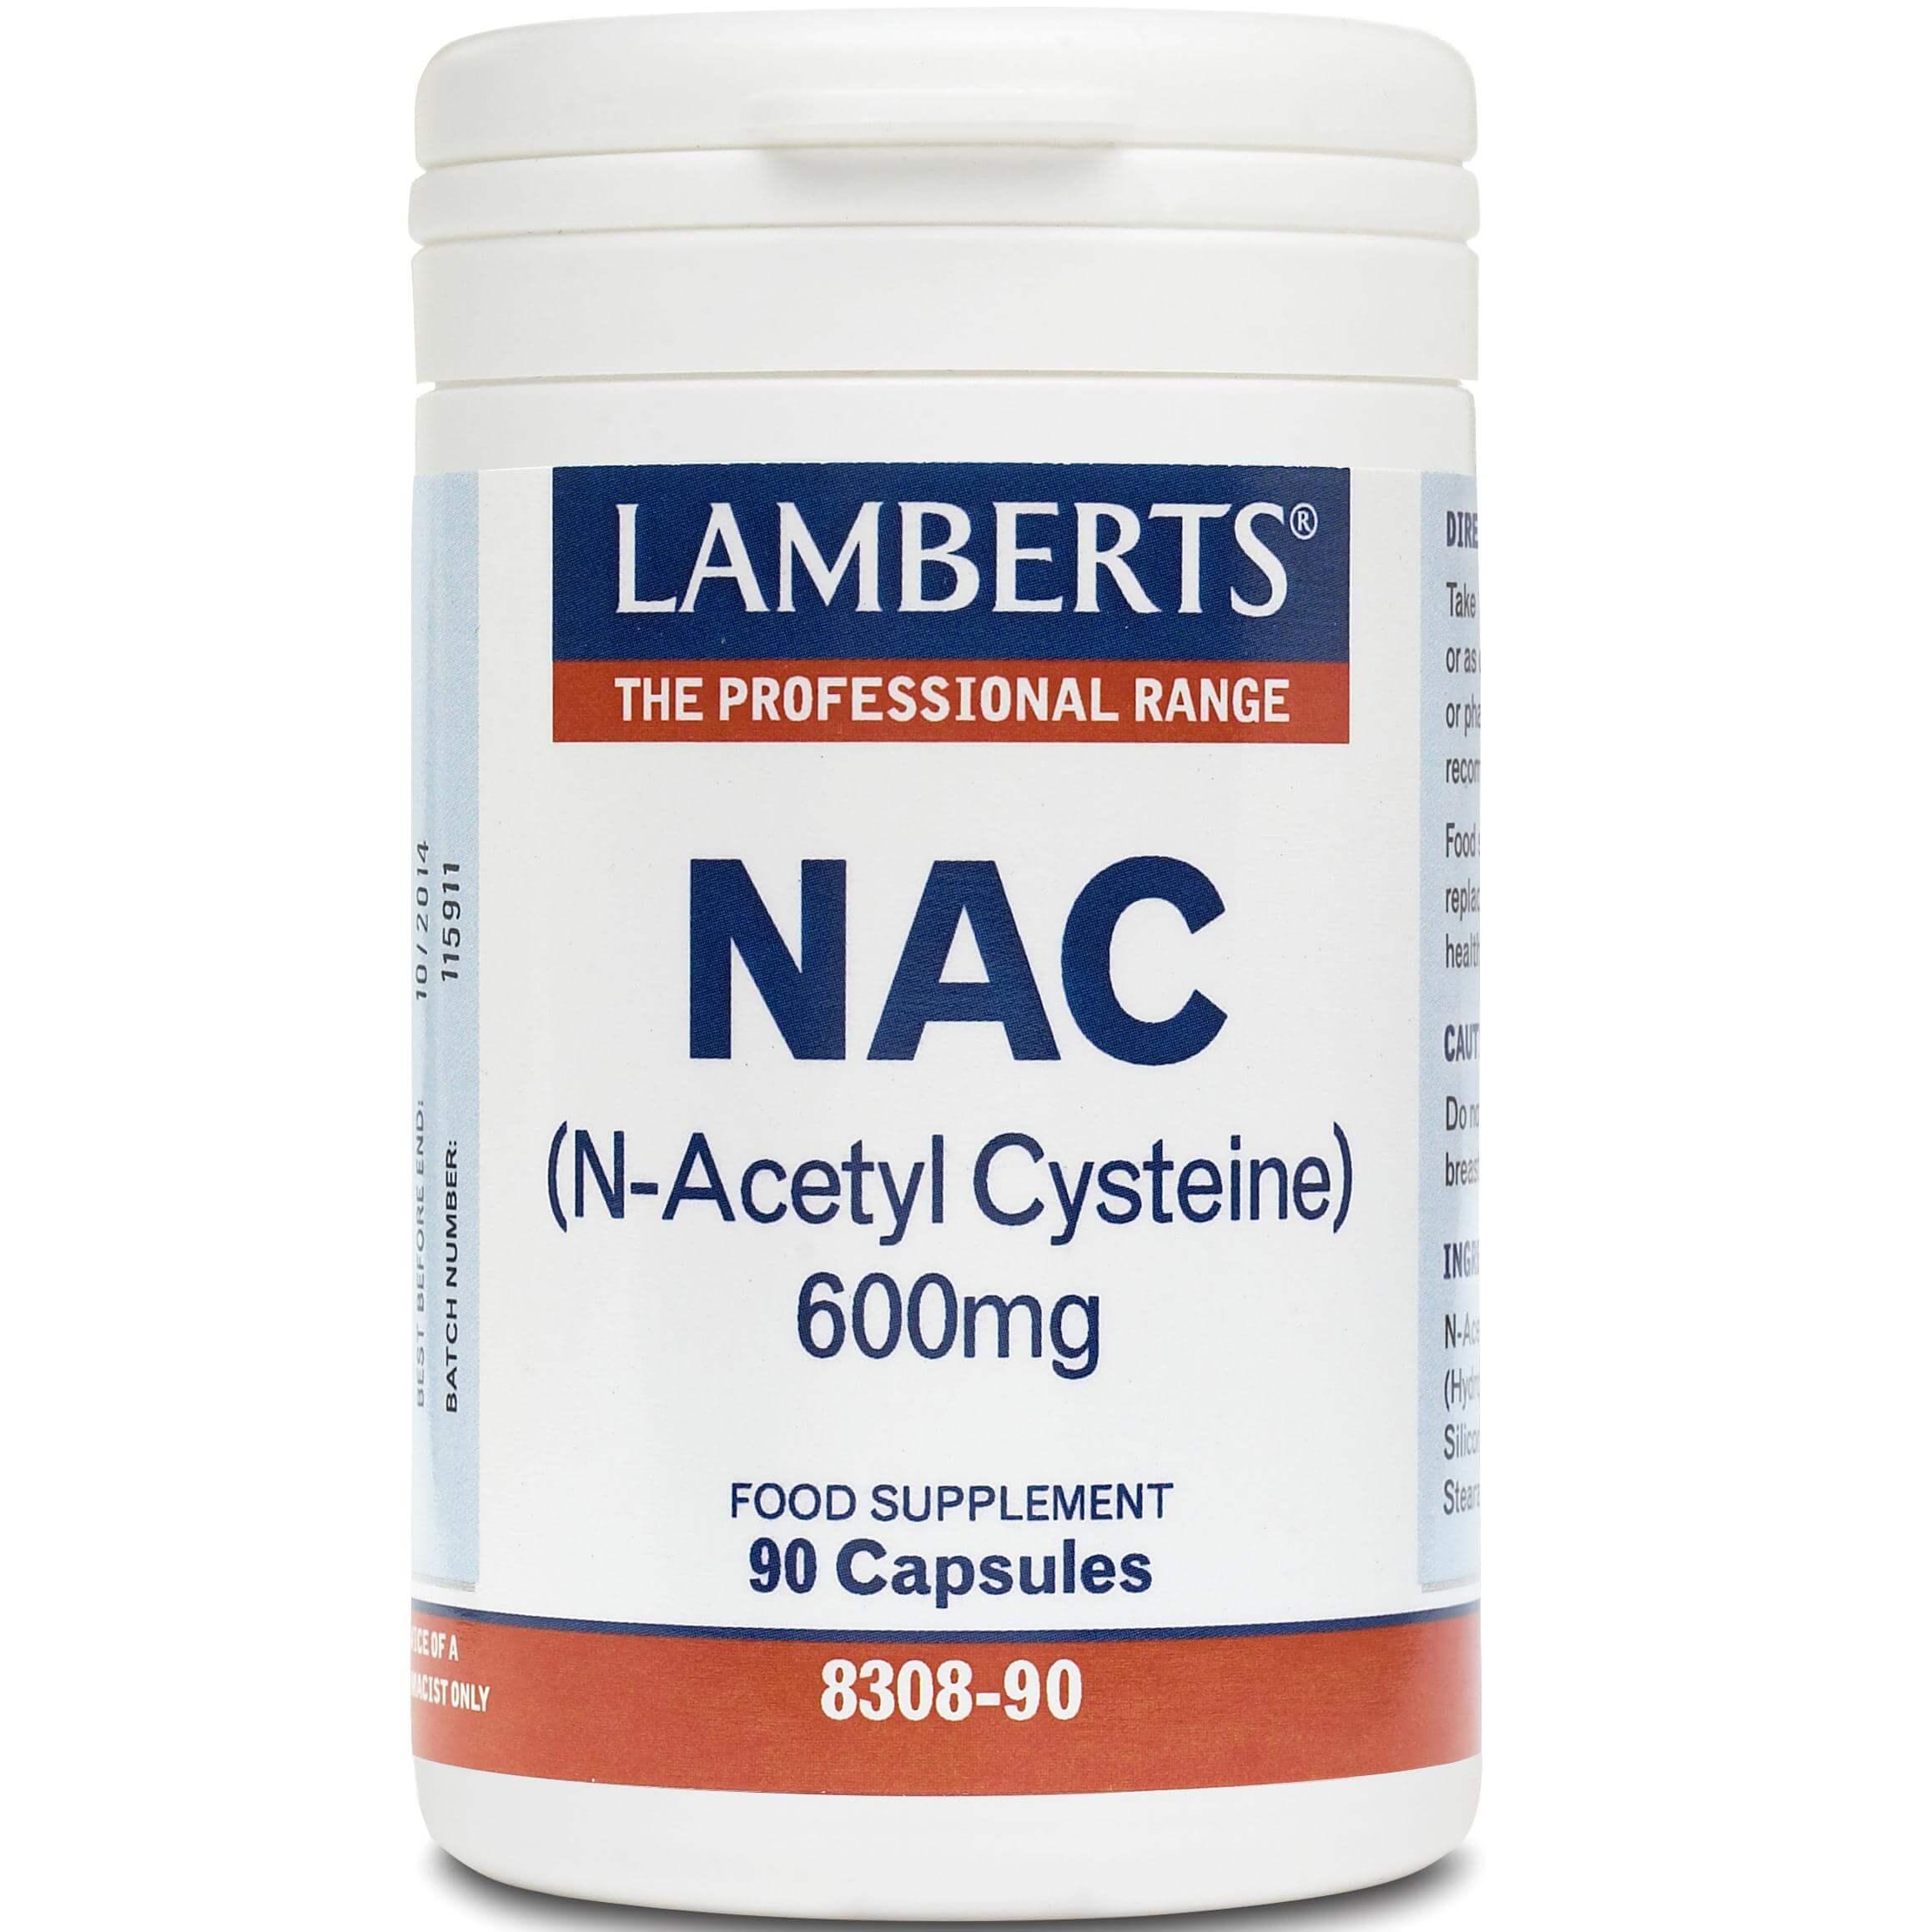 Lamberts N-Acetyl Cysteine (NAC) Συμπλήρωμα Διατροφής Ν-ακέτυλο-κυστείνης600mg 90tabs